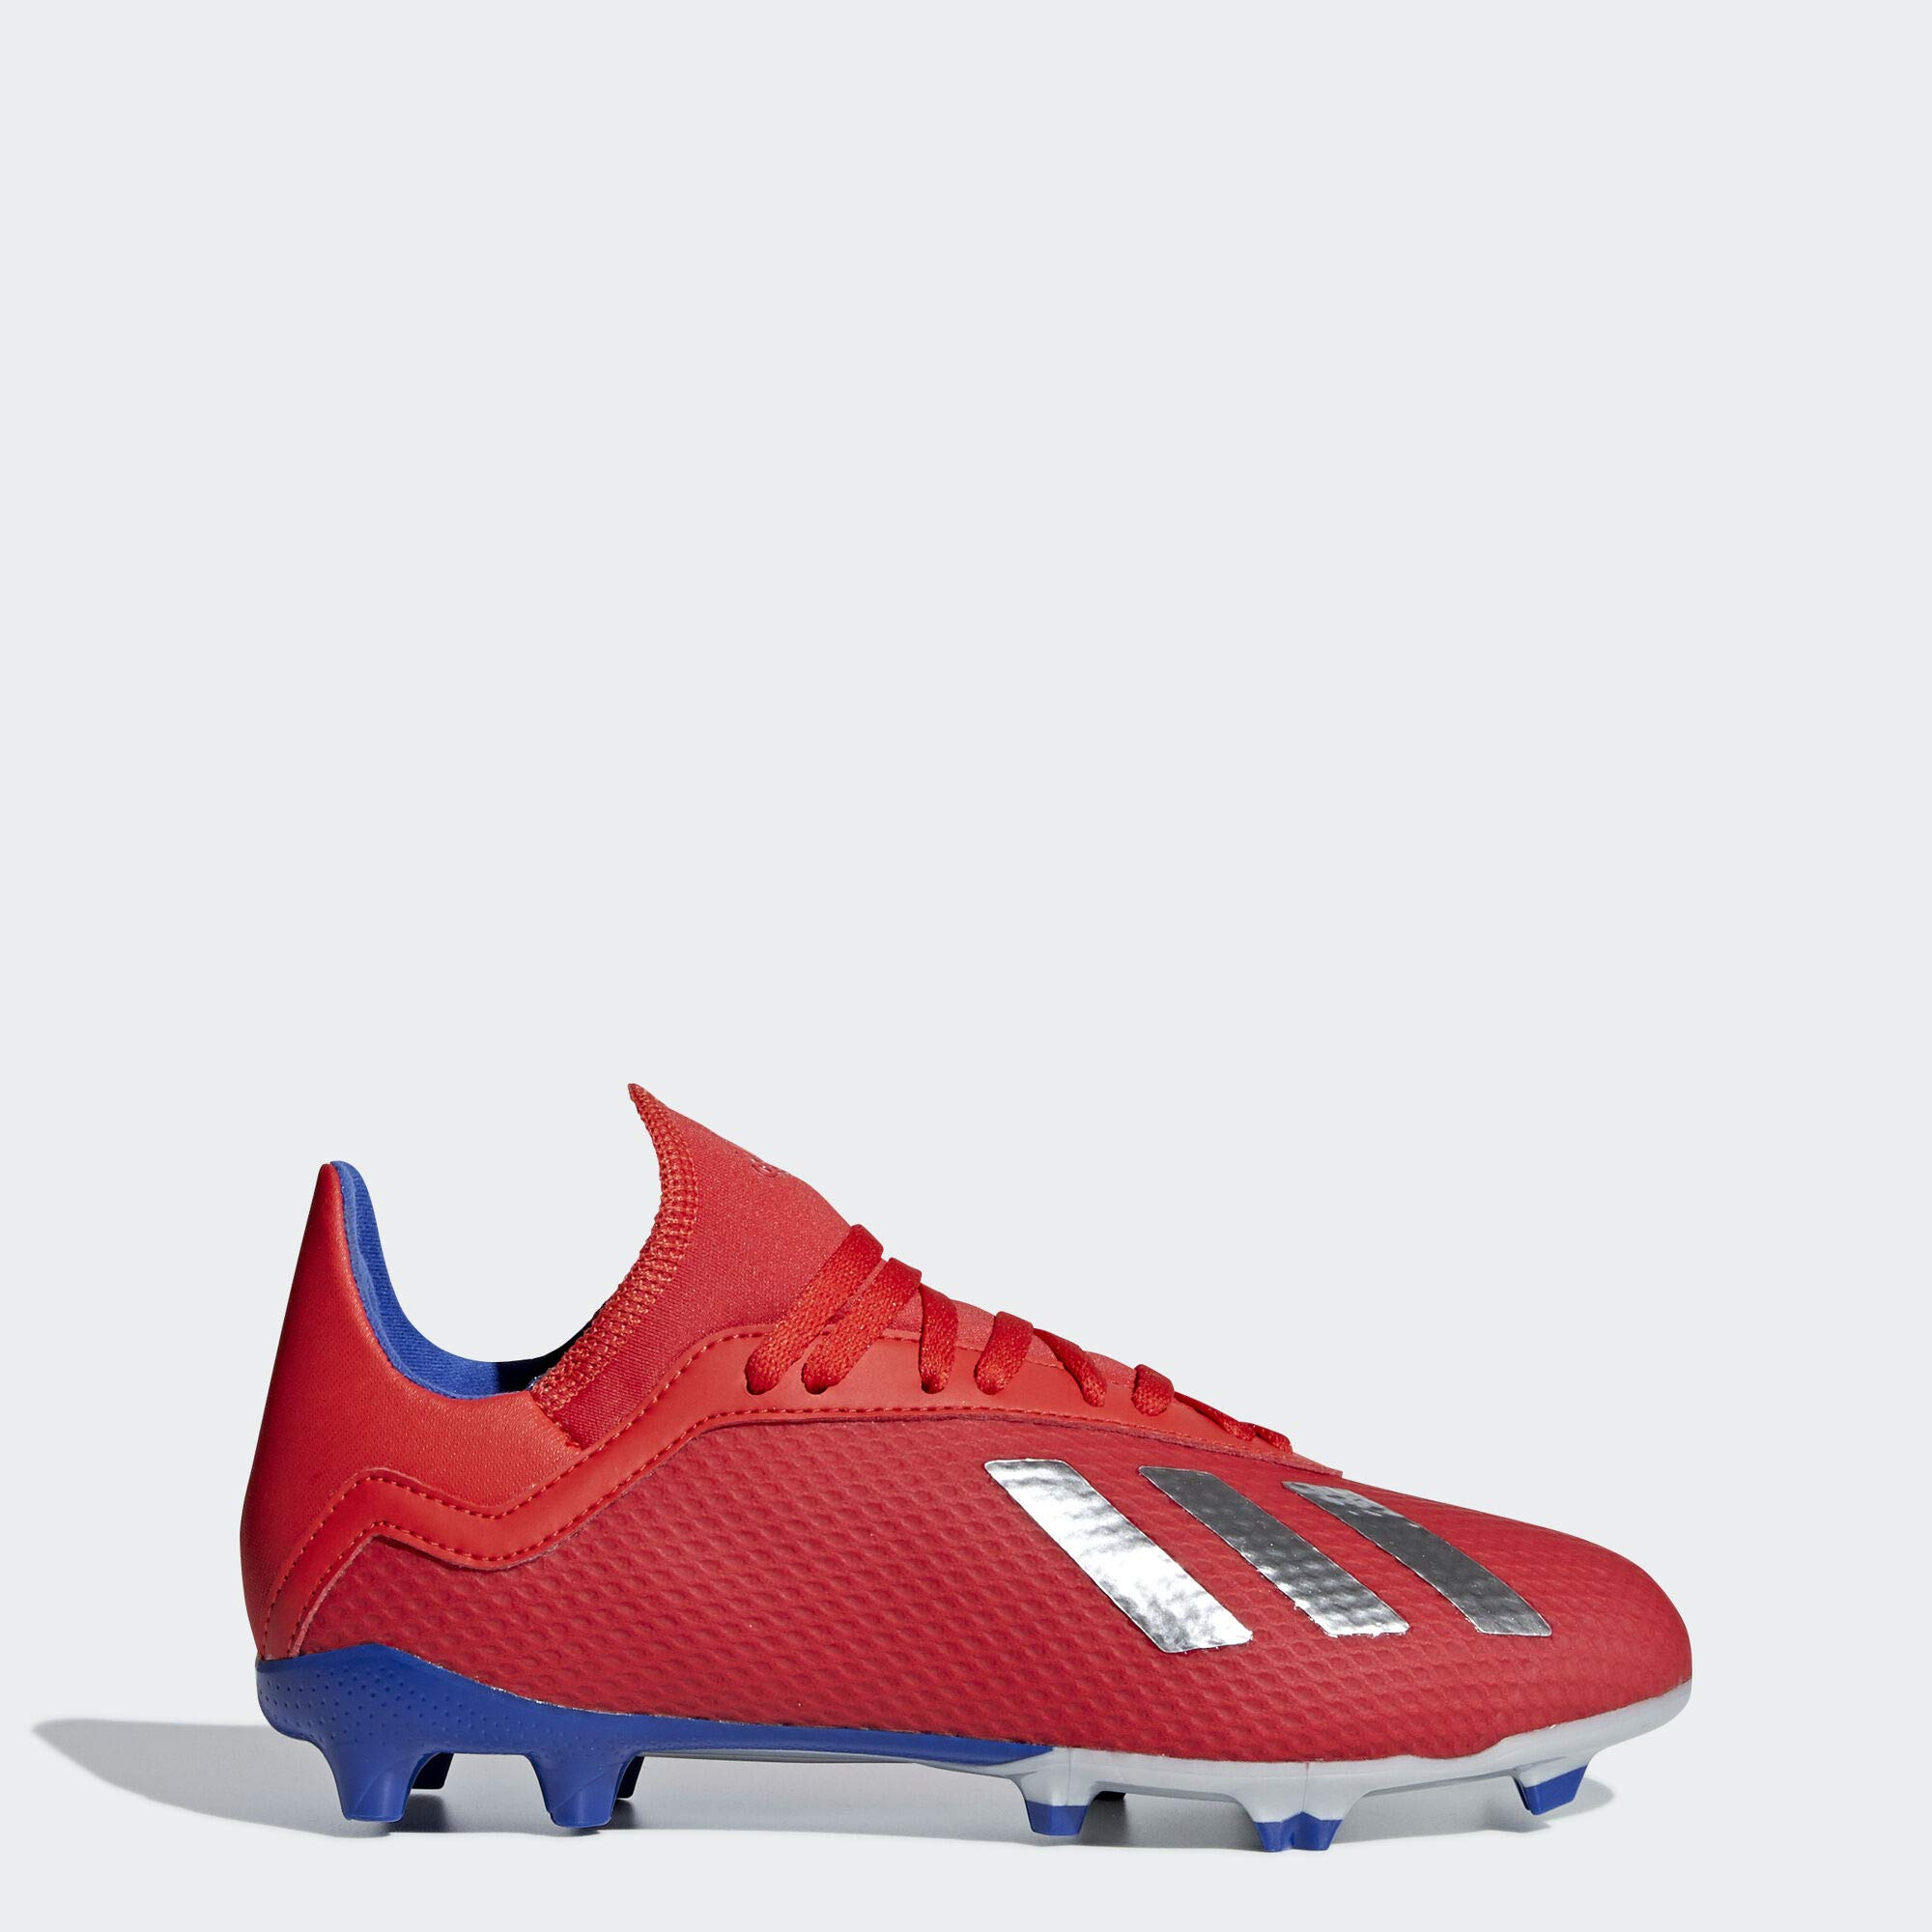 adidas Unisex X 18.3 FG, Active red/Silver Metallic/Bold Blue, 6 M US Big Kid by adidas